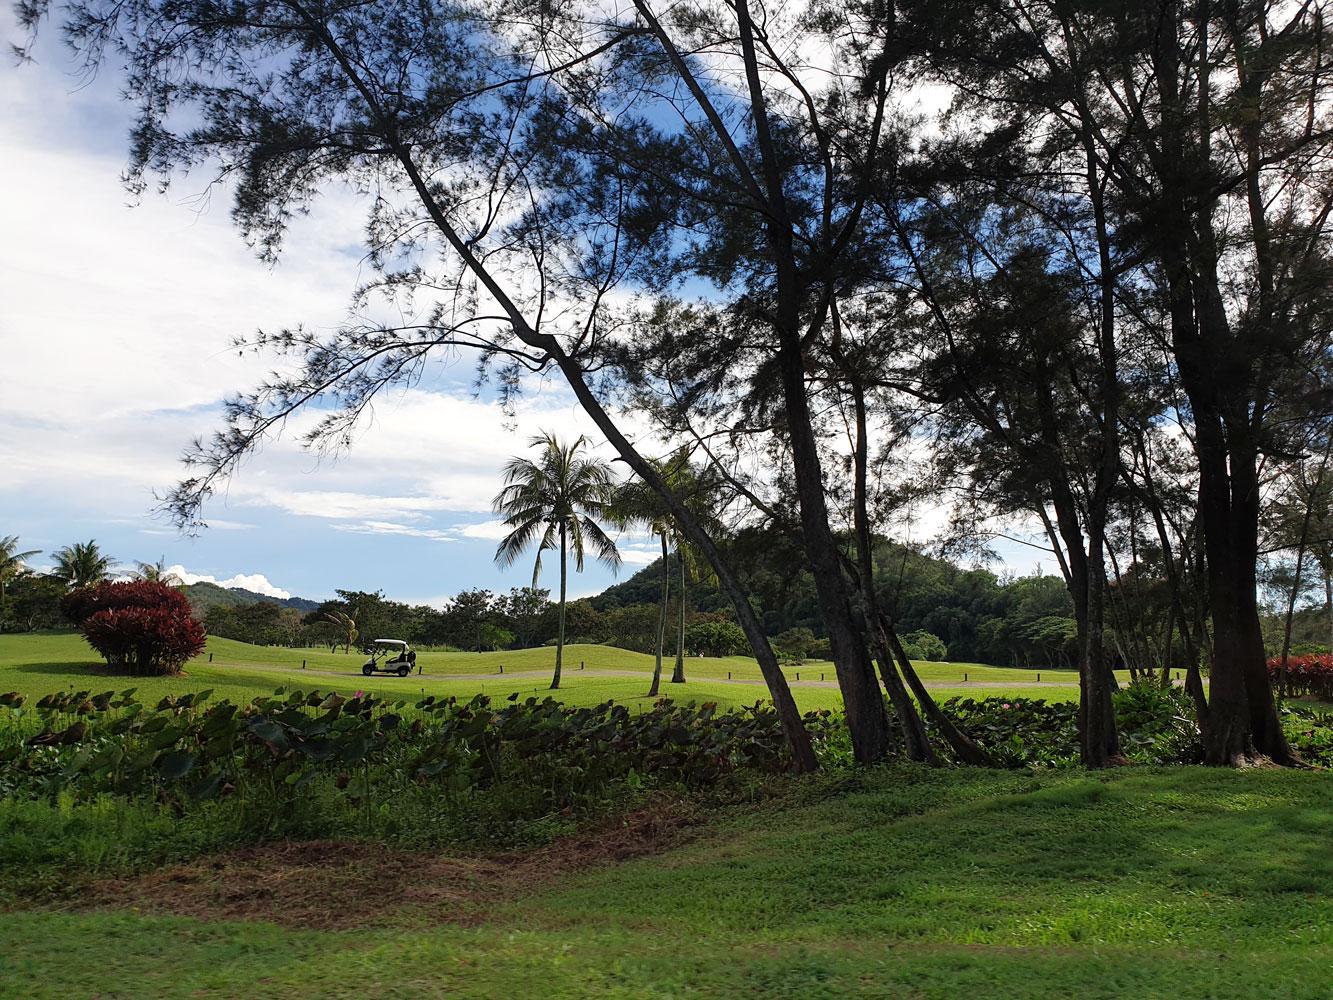 shangrila_rasaria_dalitbay_golfcourse.jpg